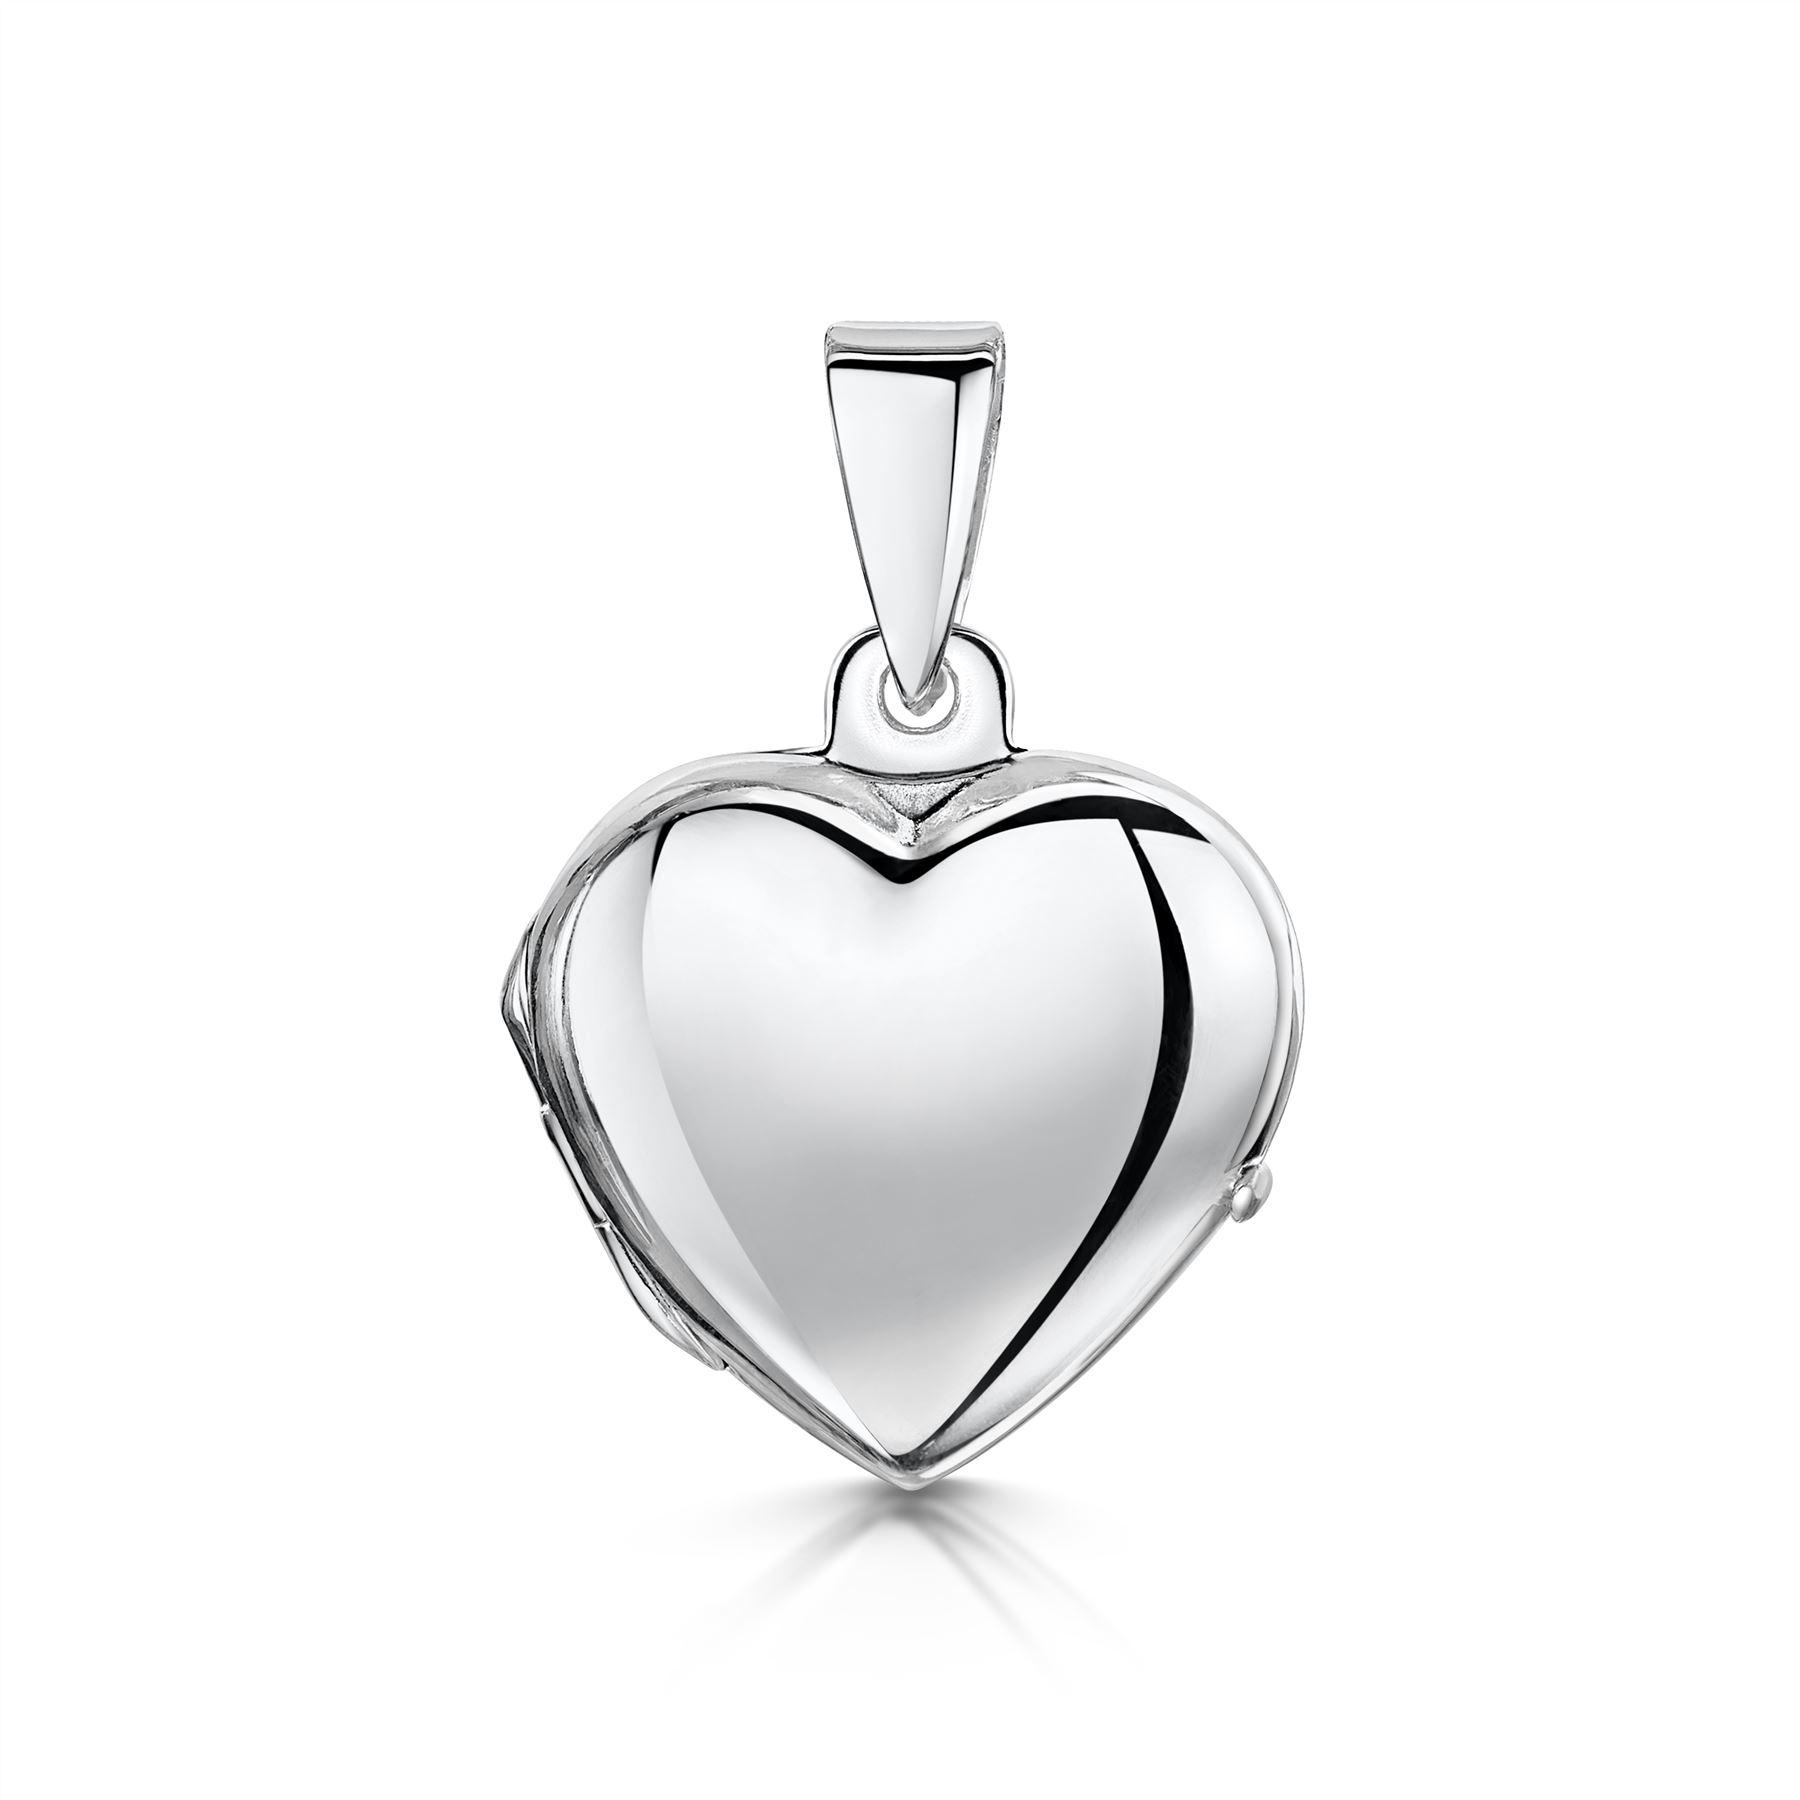 Amberta-Medallon-en-Fina-Plata-De-Ley-925-en-Formas-Diferentes-Para-Foto-y-Gemas miniatura 13